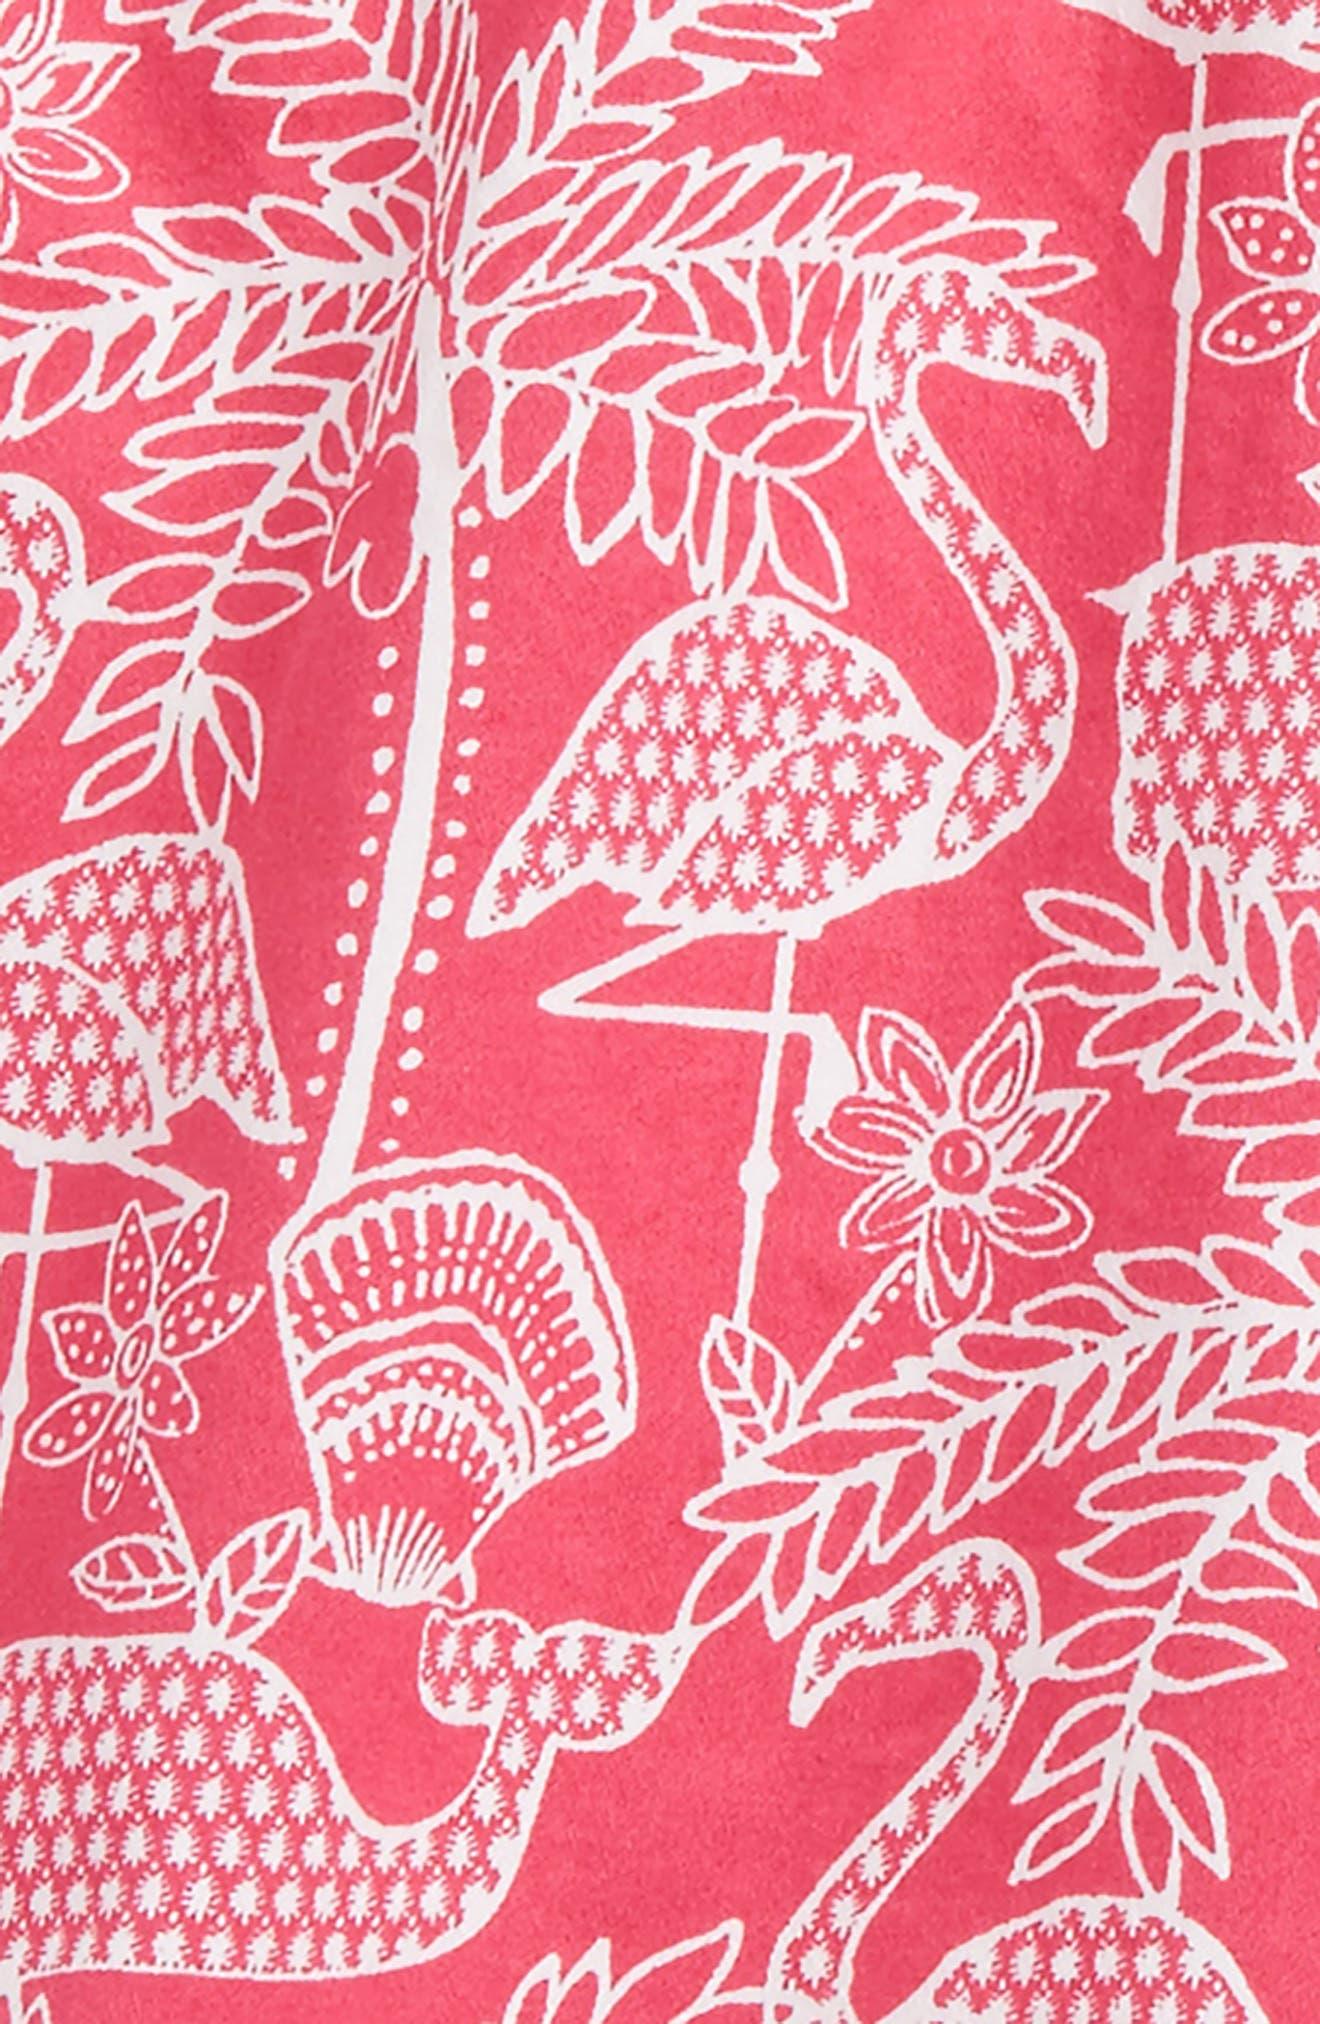 Flamingo Print Shorts,                             Alternate thumbnail 2, color,                             Rhododendron